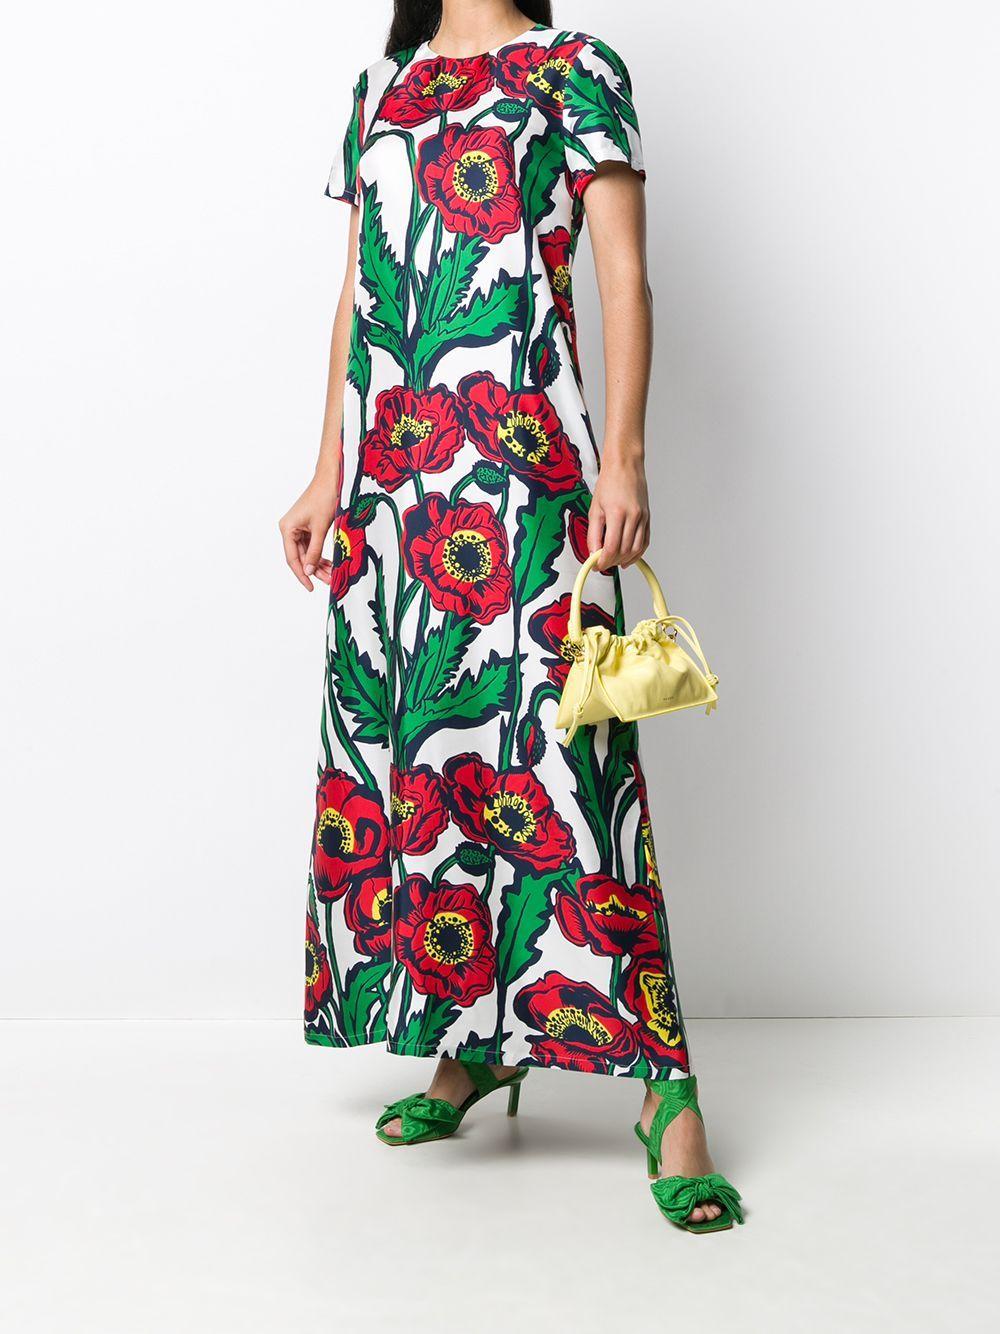 La Doublej Swing Big Blooms Print Dress Farfetch In 2020 Print Dress Dresses Big Blooms